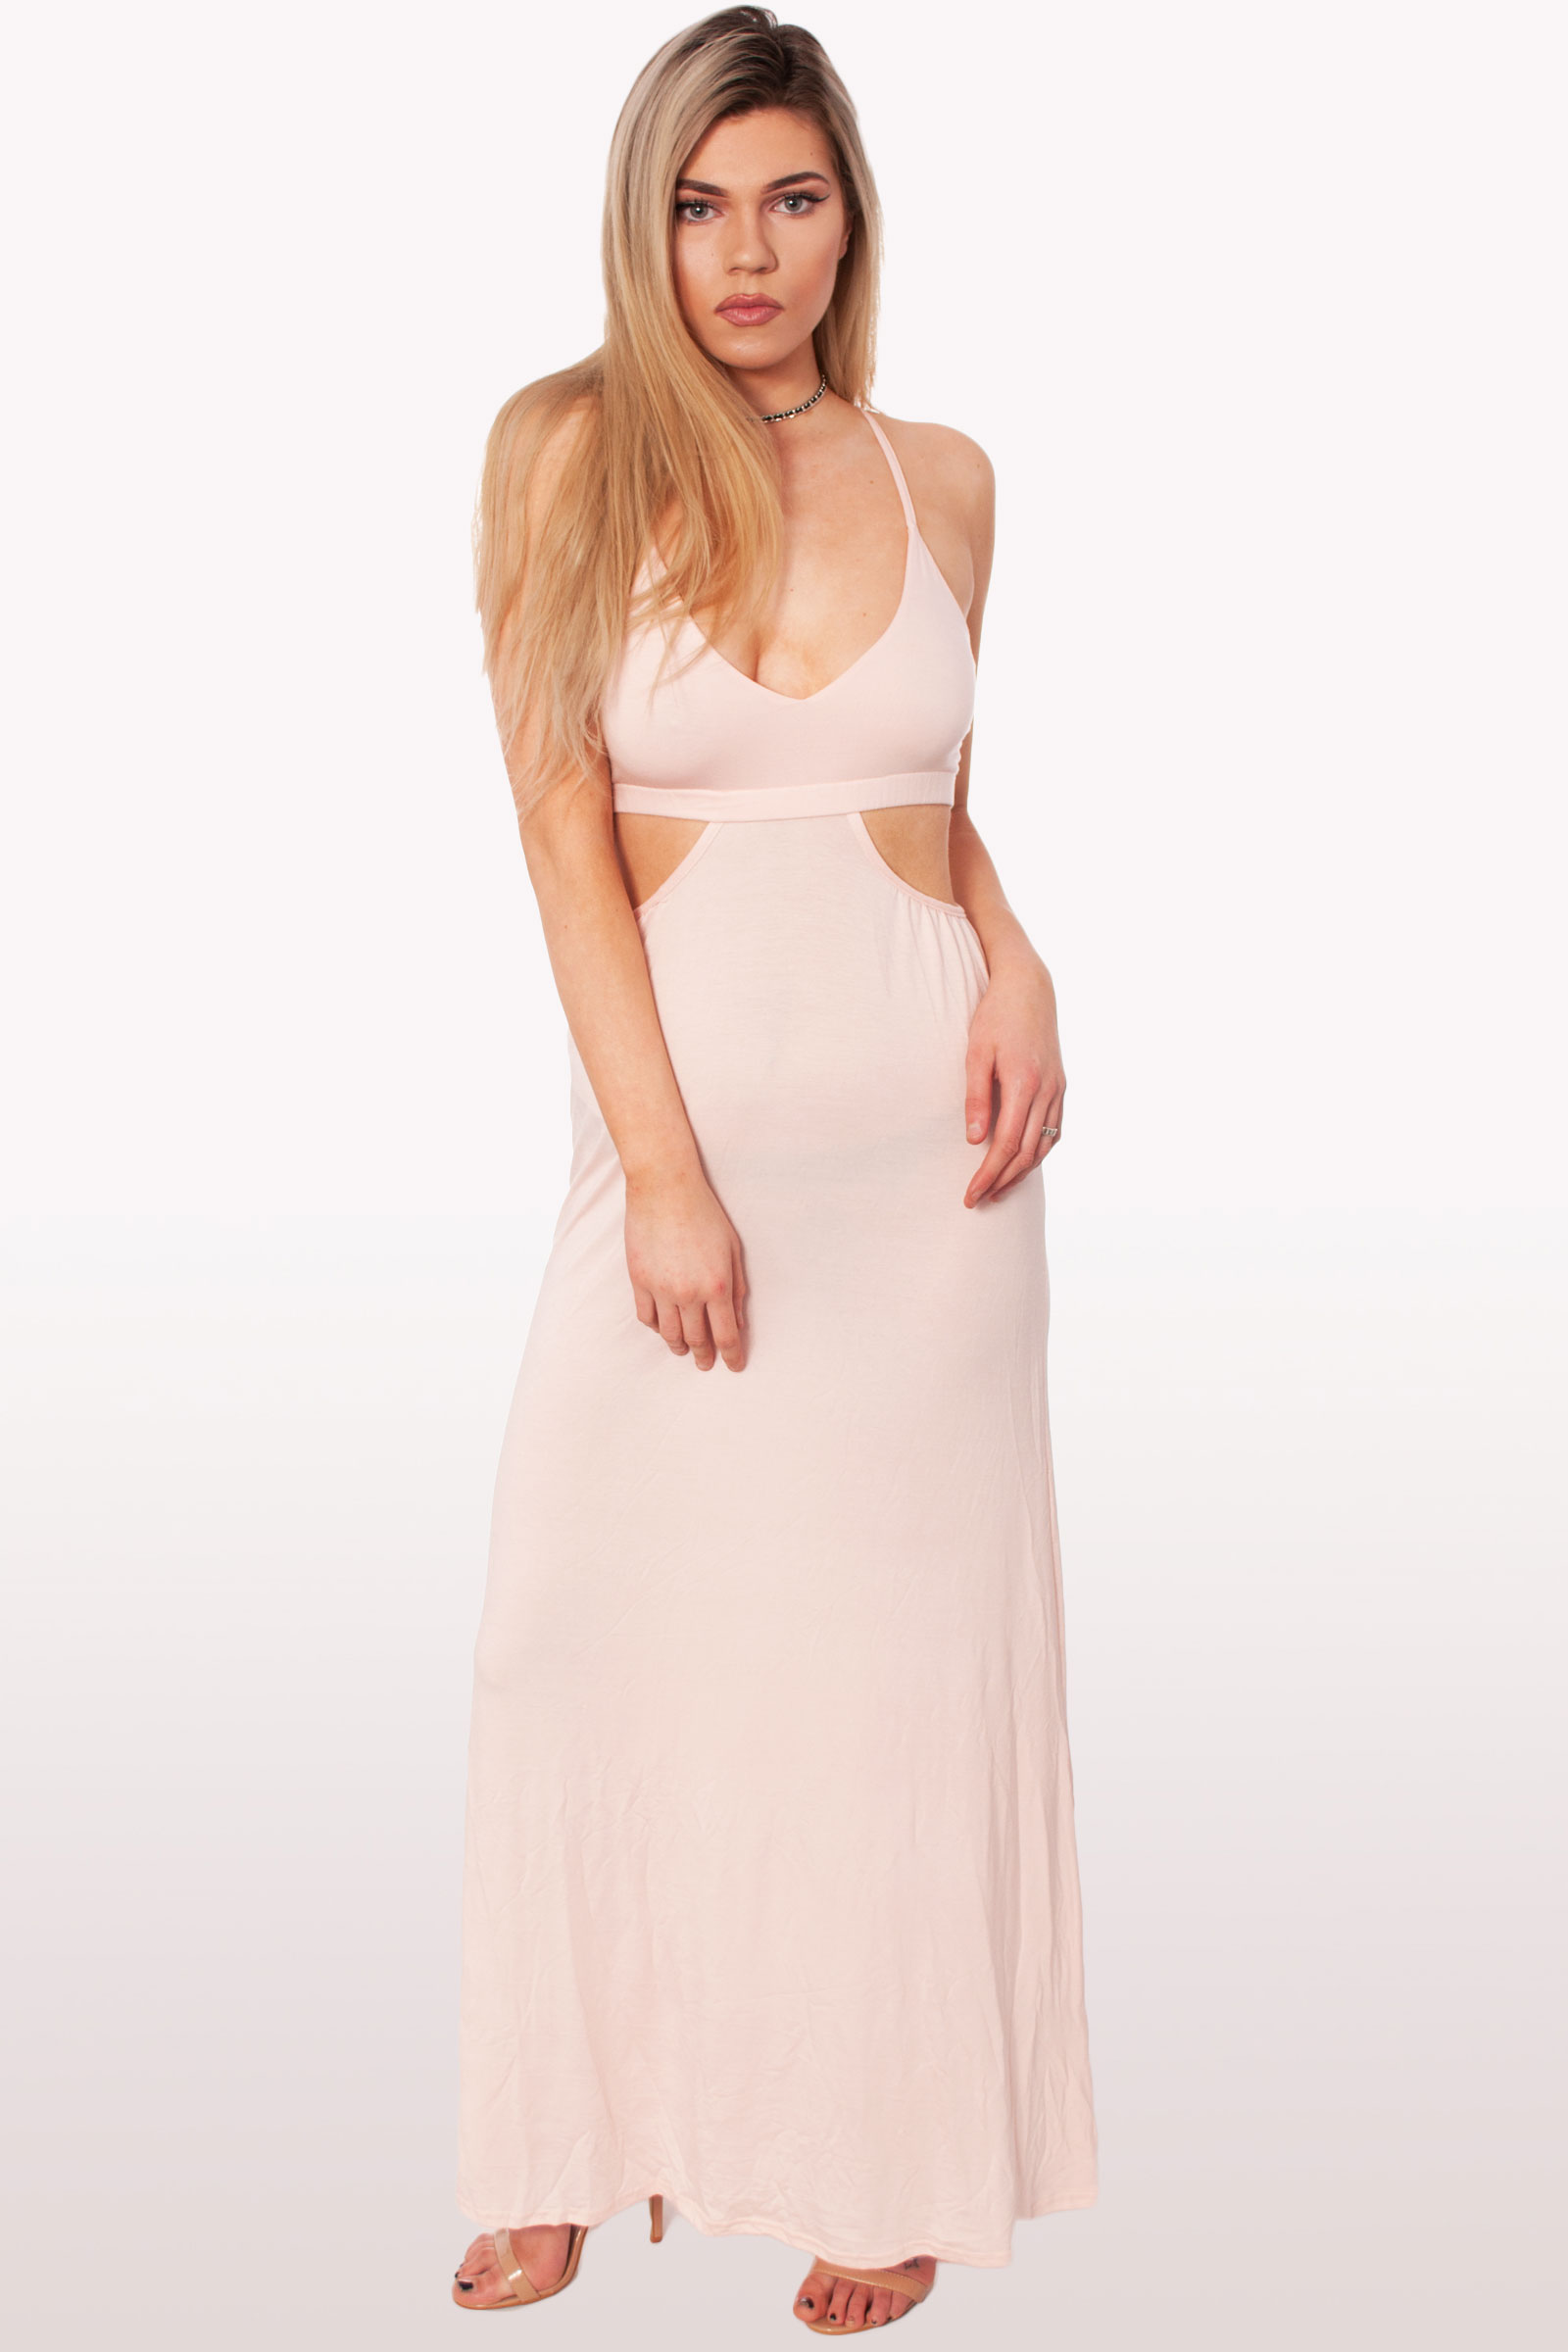 7a931671764 Pale Pink Cut Out Maxi Dress